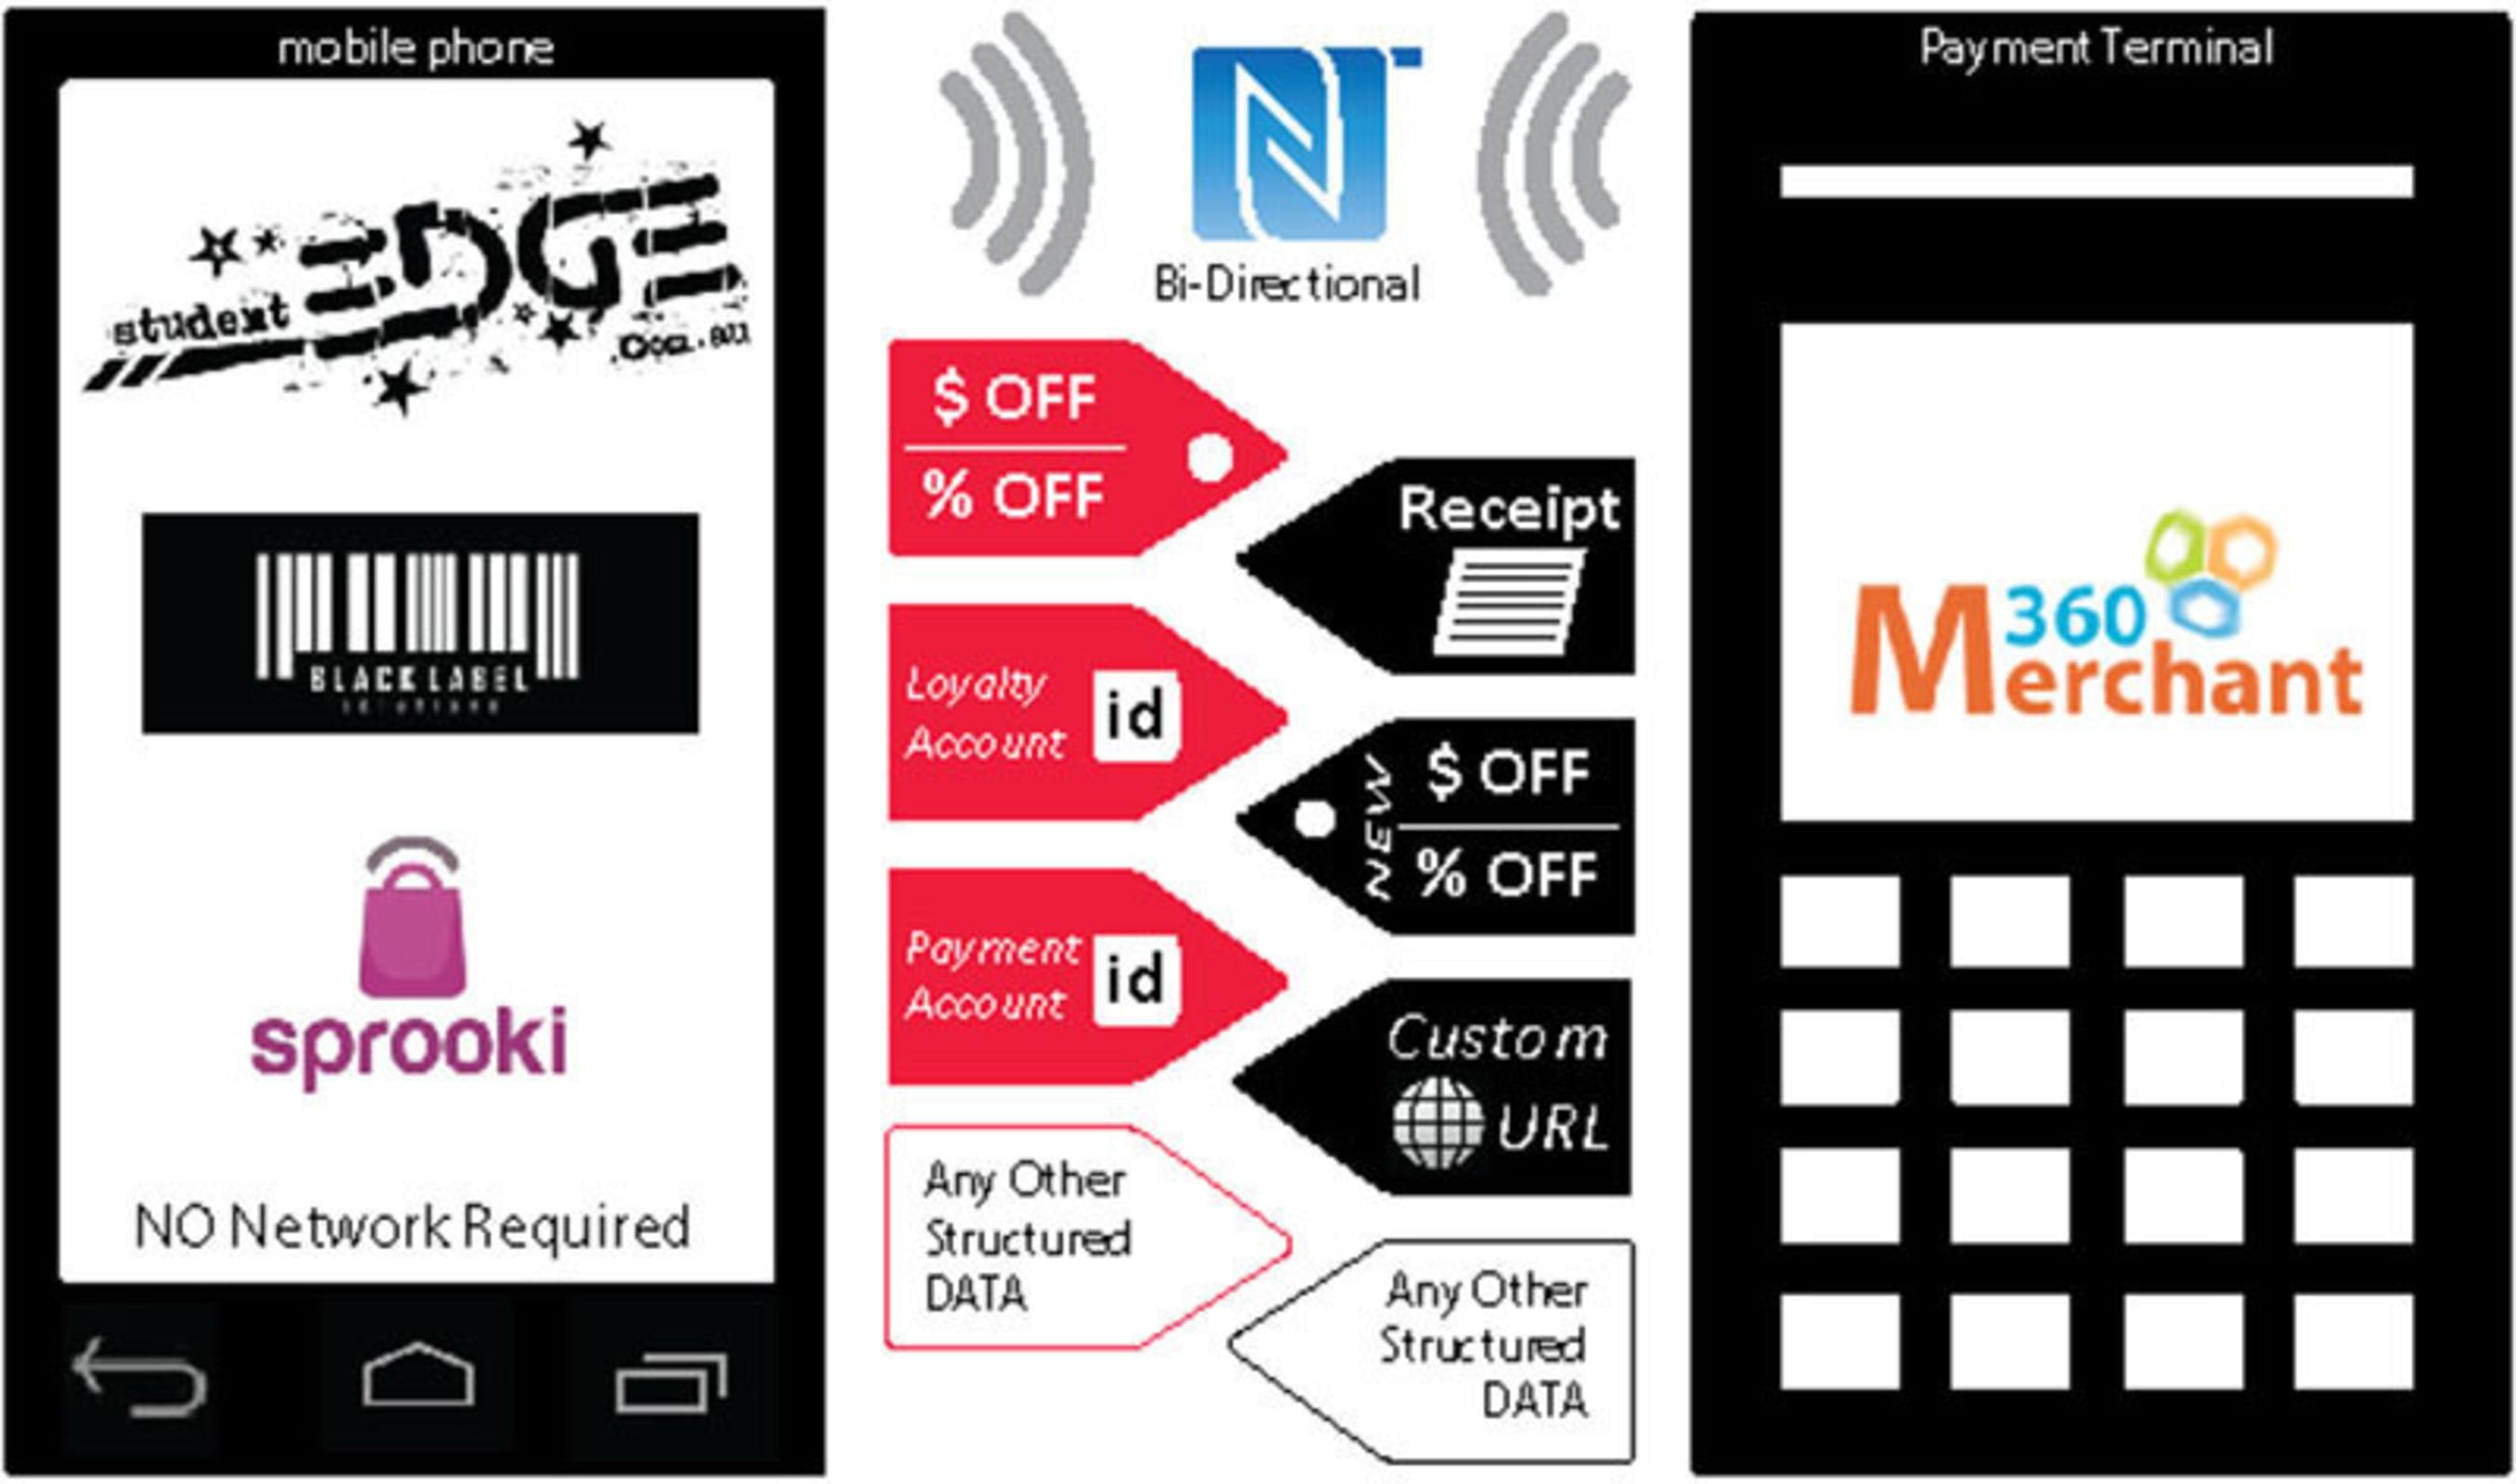 Merchant360 NFC at POS.  (PRNewsFoto/Merchant360, Inc.)